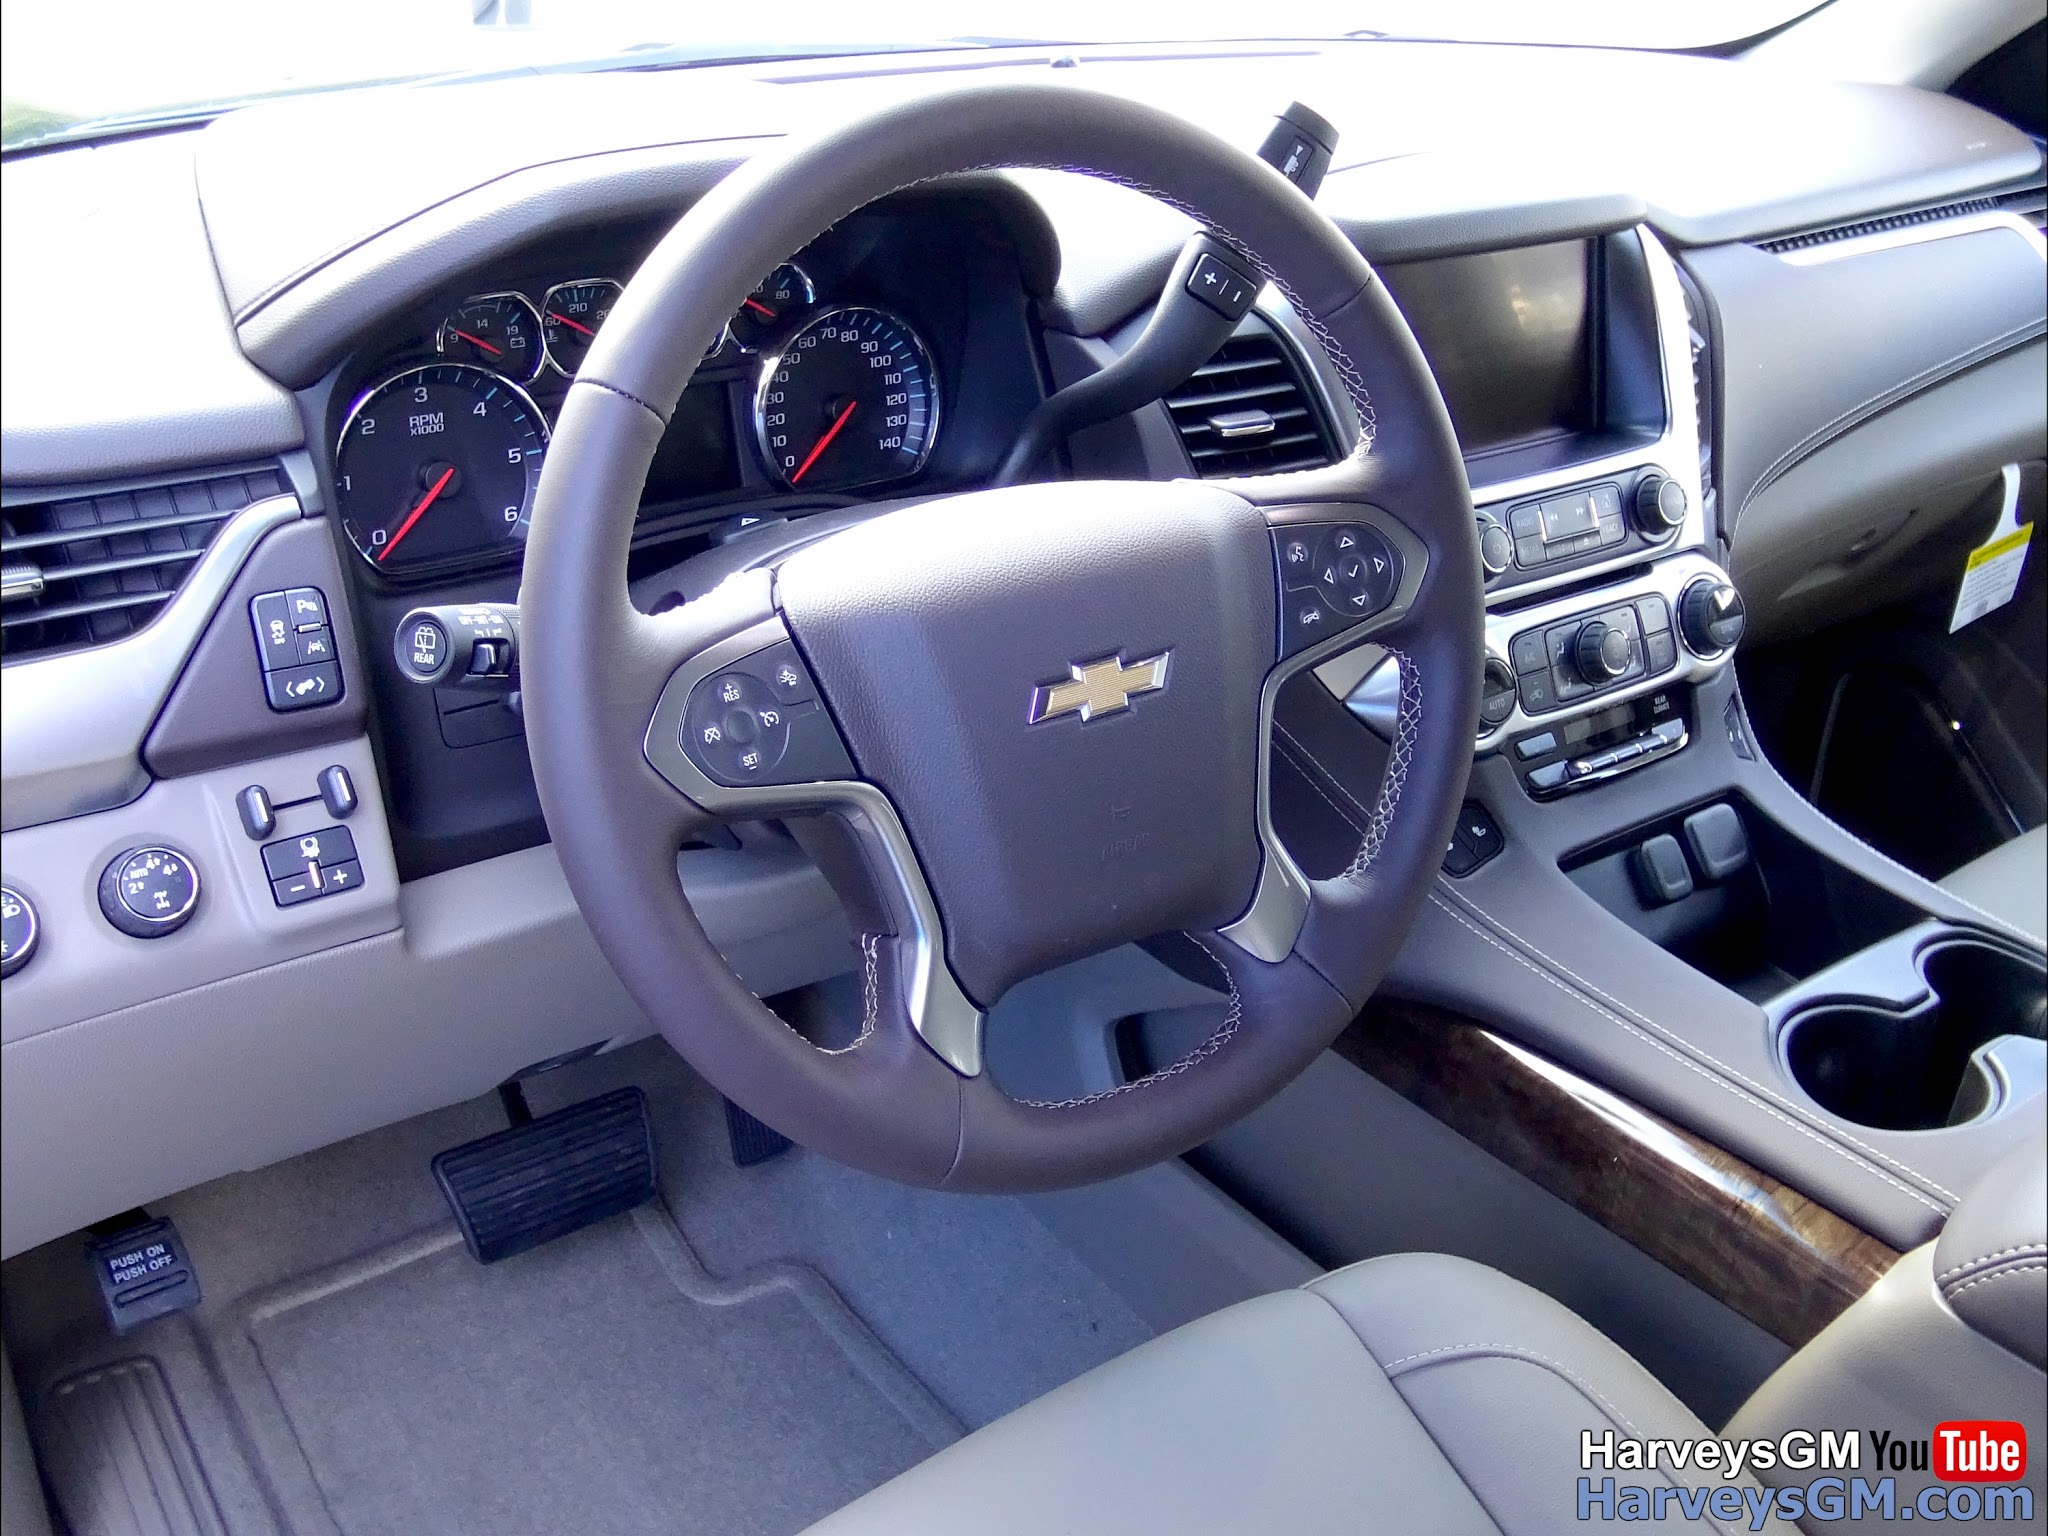 2016 Chevy Suburban 4wd 1500 Lt Chevrolet Harveys Gm Radford Trailer Brake Wiring Virginia